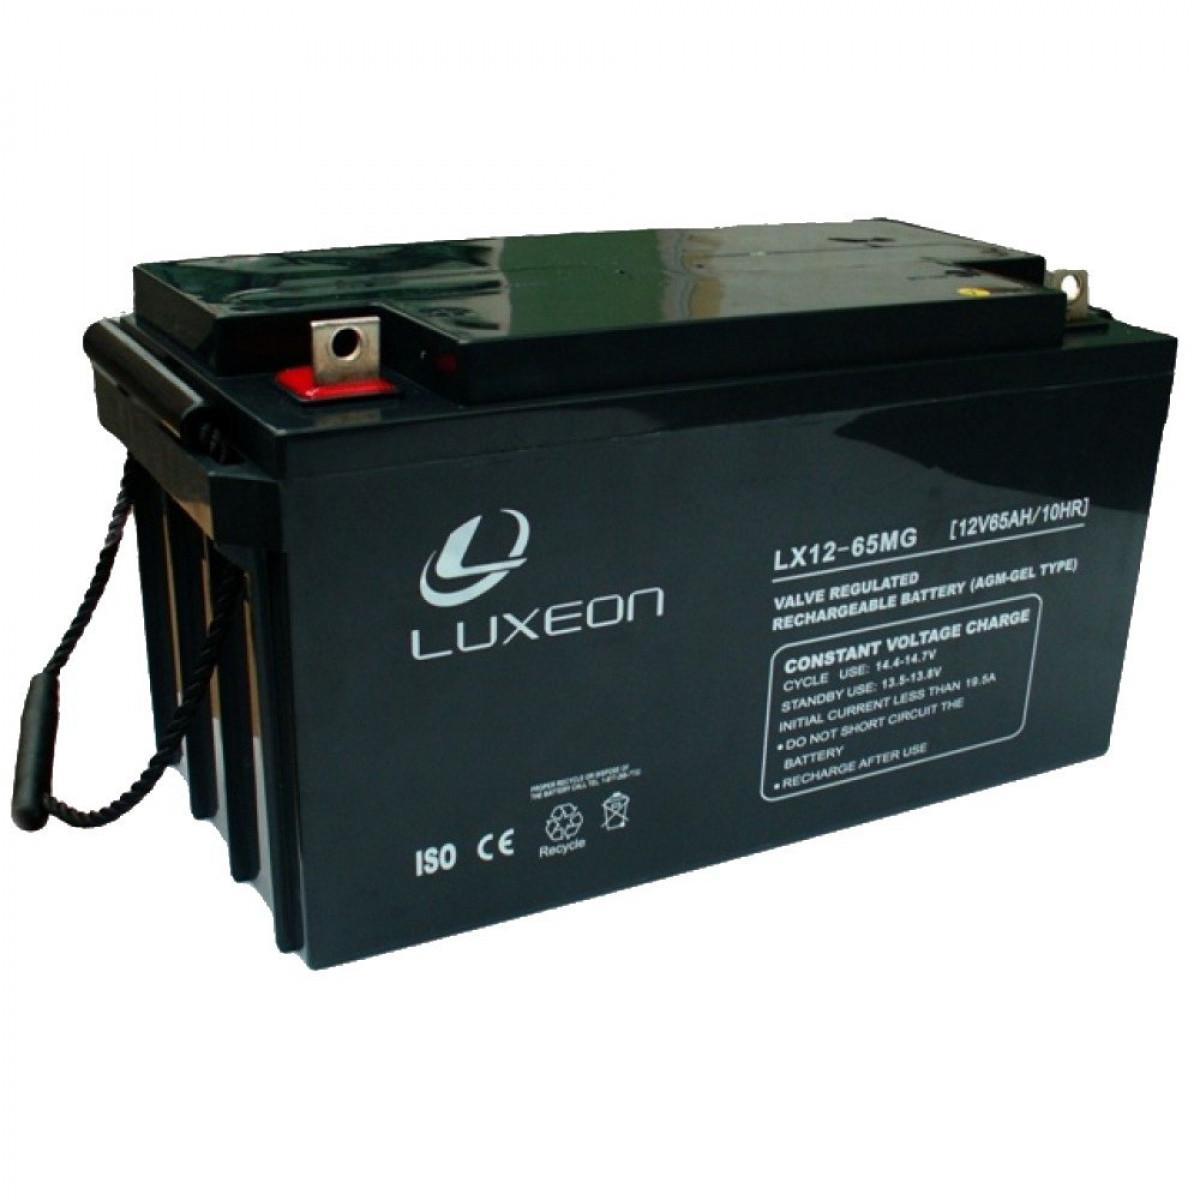 Аккумуляторная батарея Luxeon LX12-65MG 65Ач